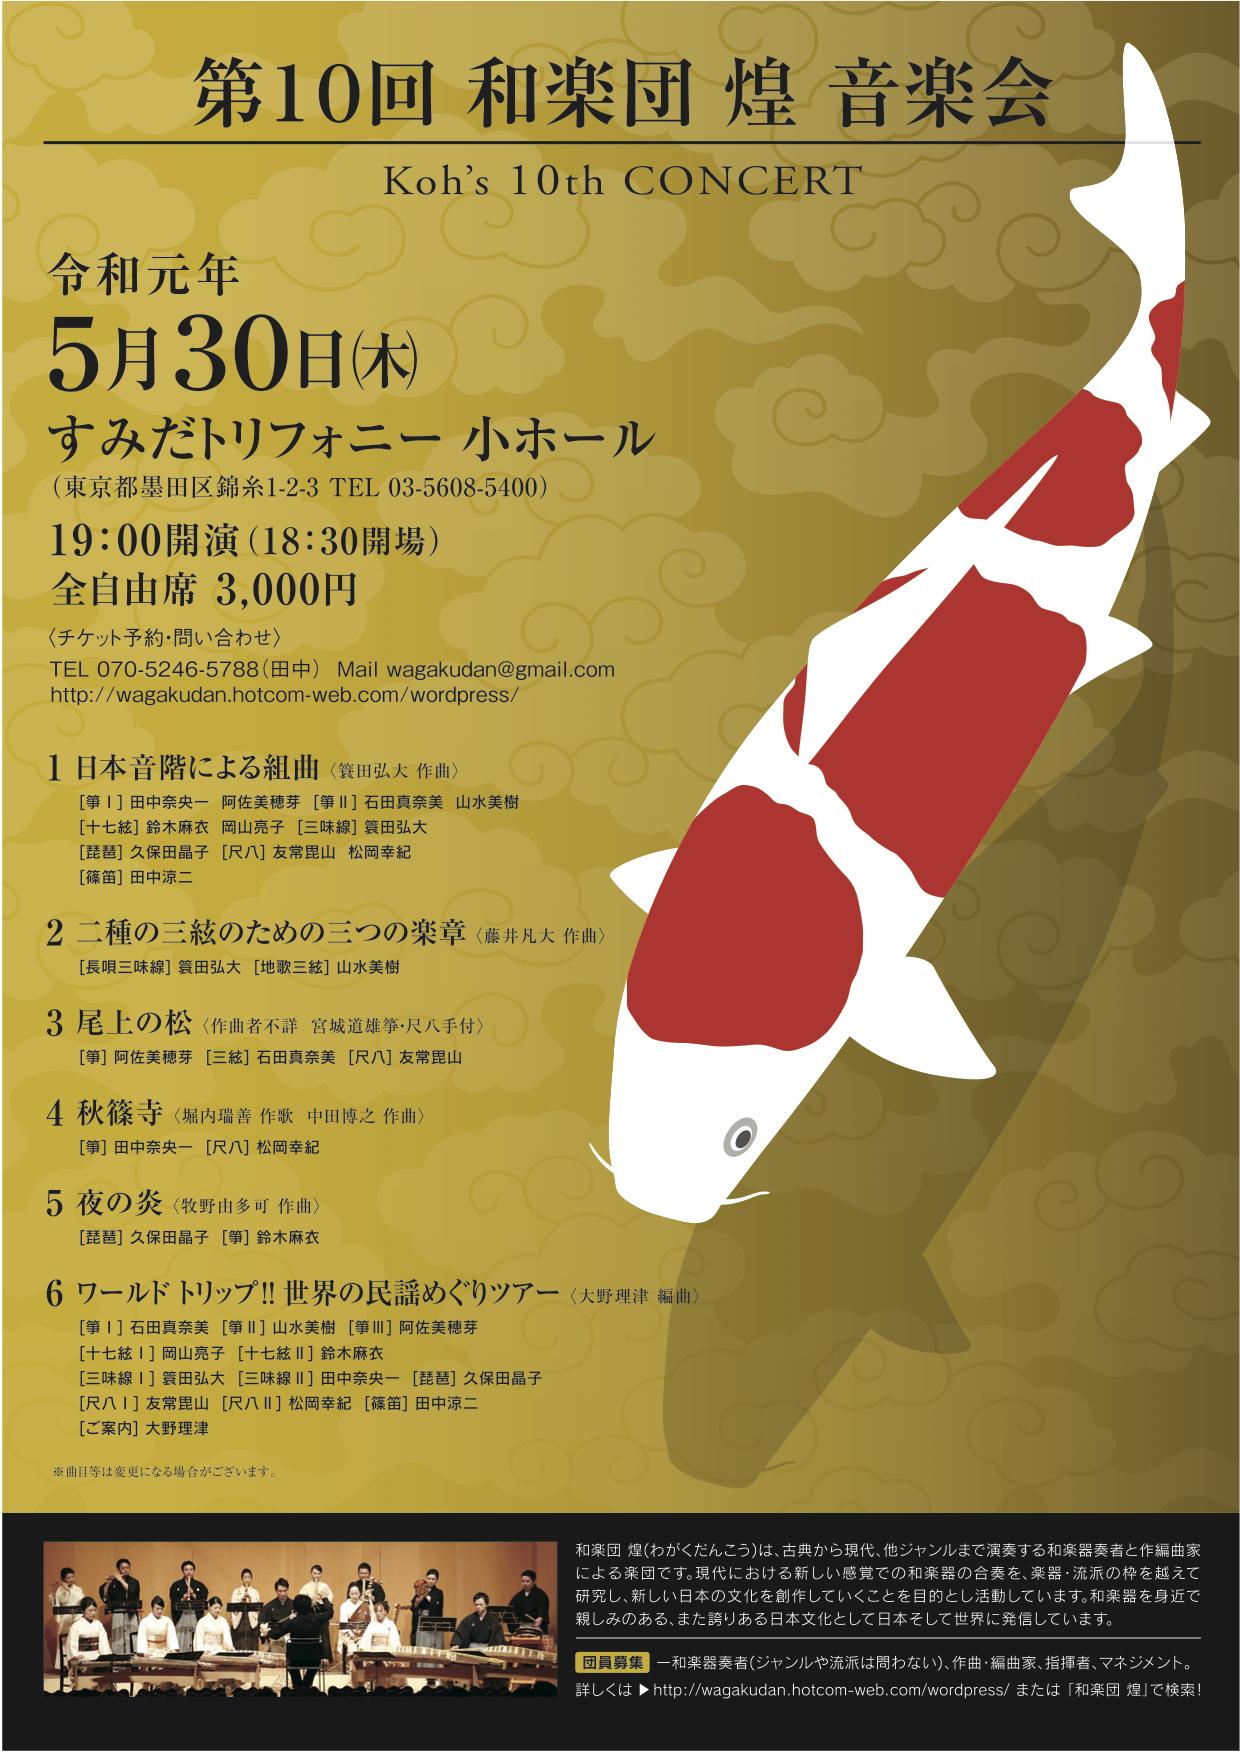 Koh2019_Ongakukai_Flyer